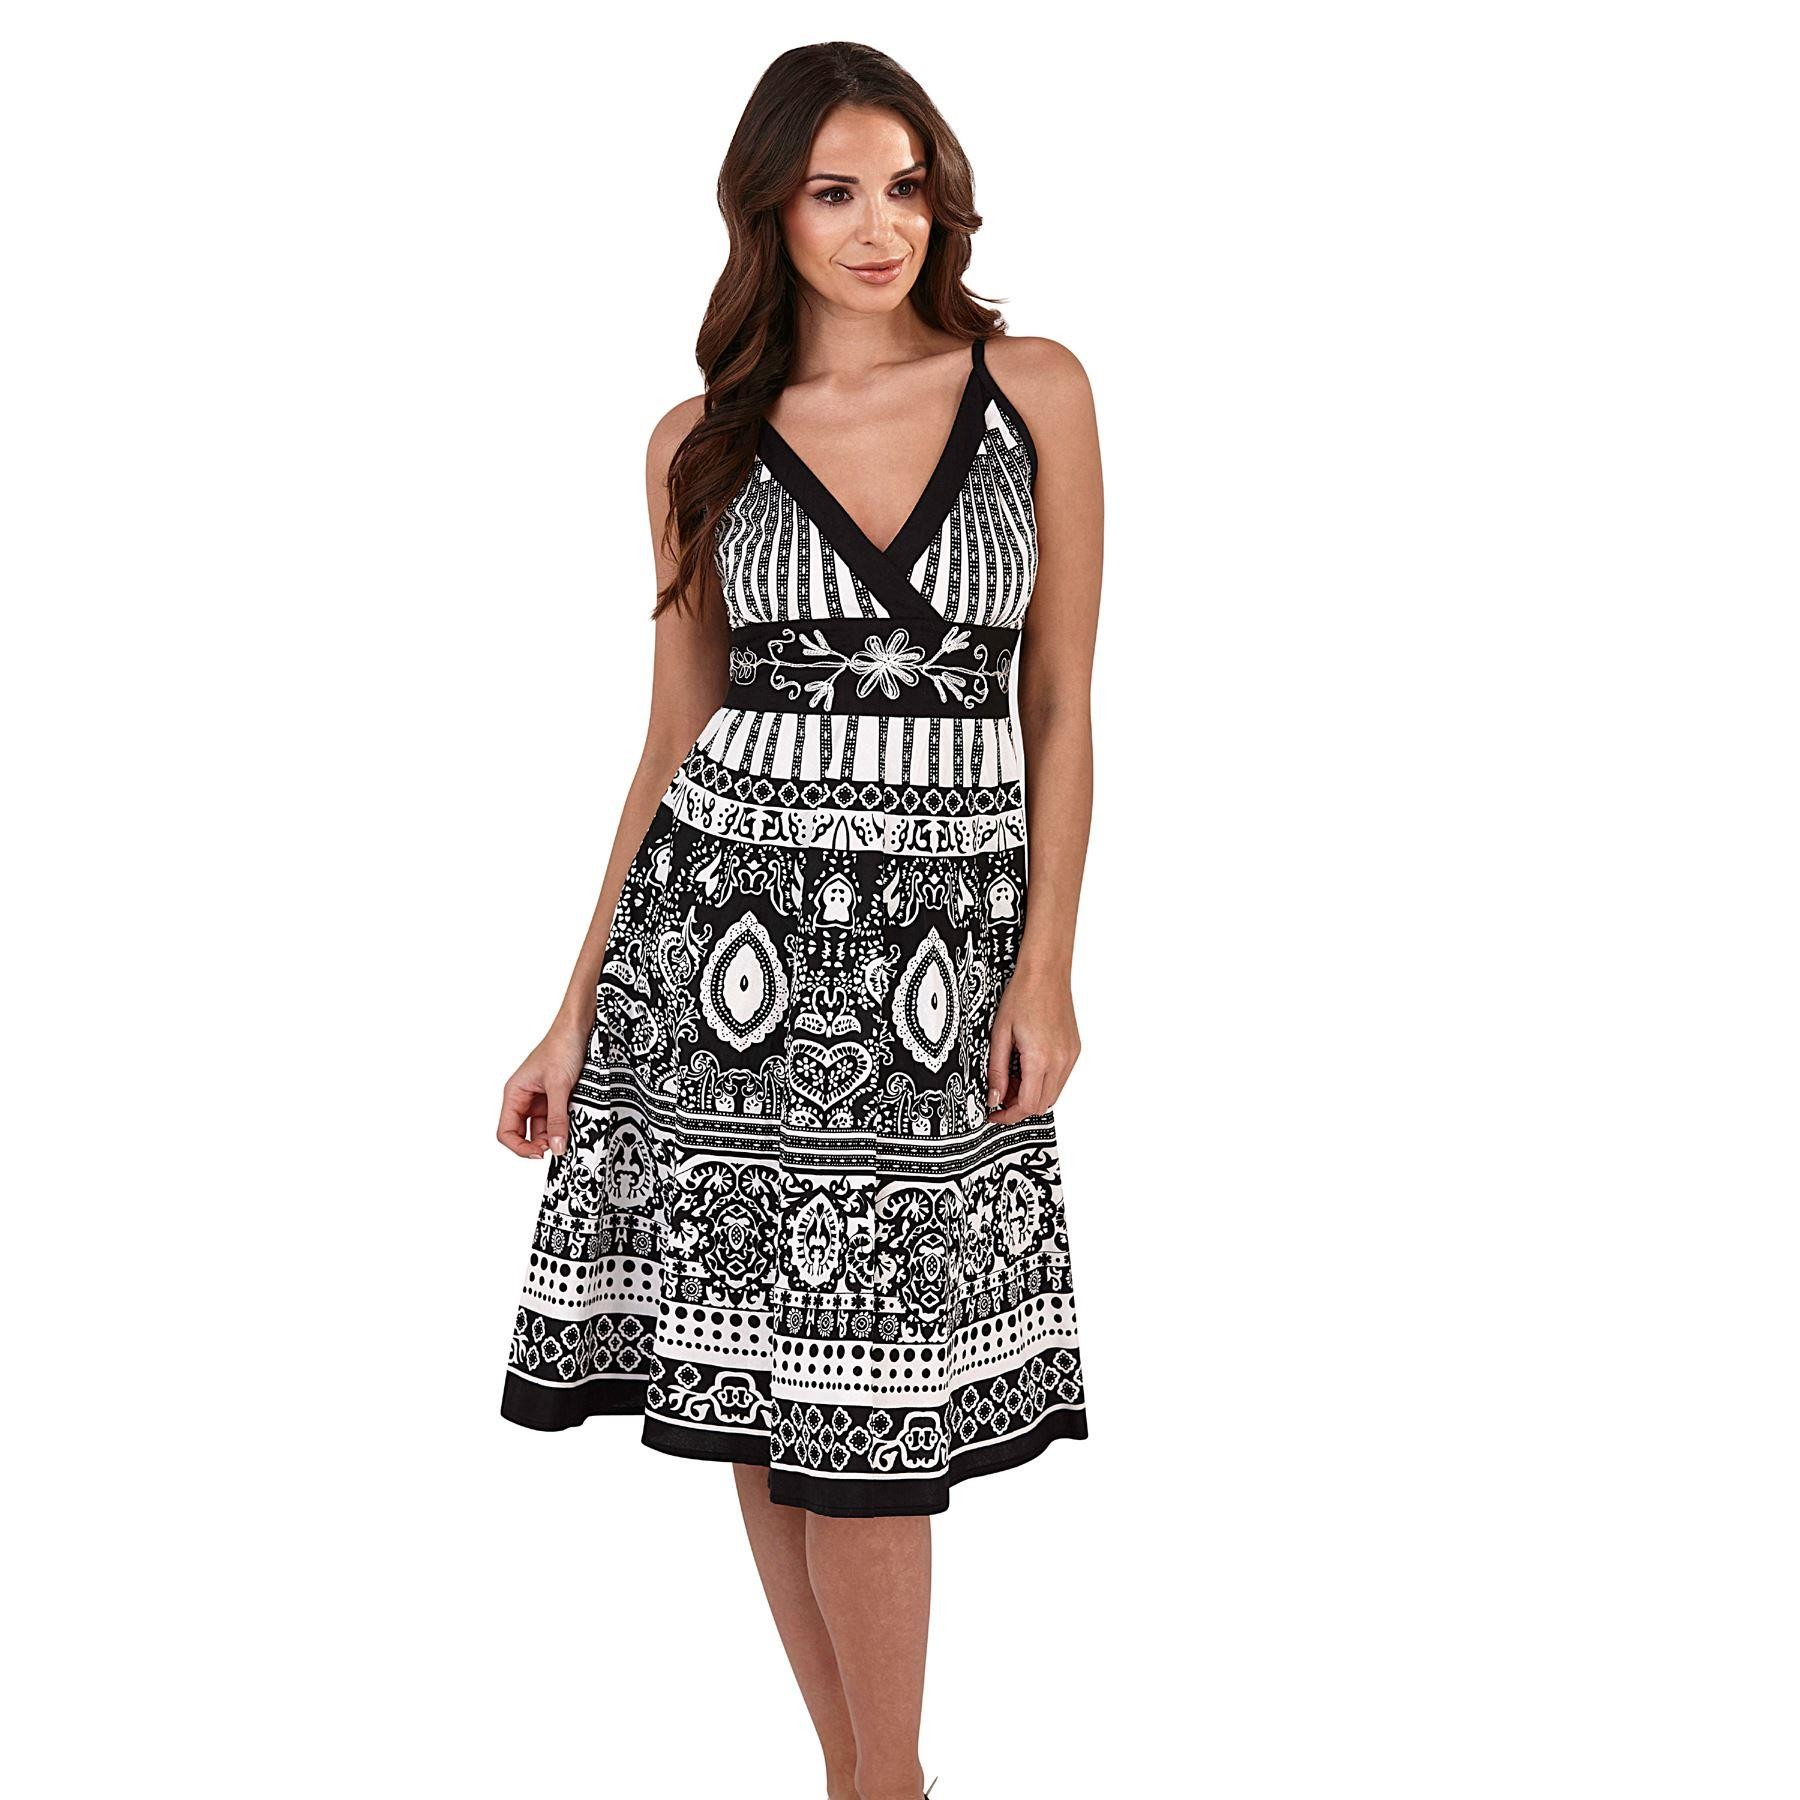 Pistachio Paisley Crossover Dress - Black/White